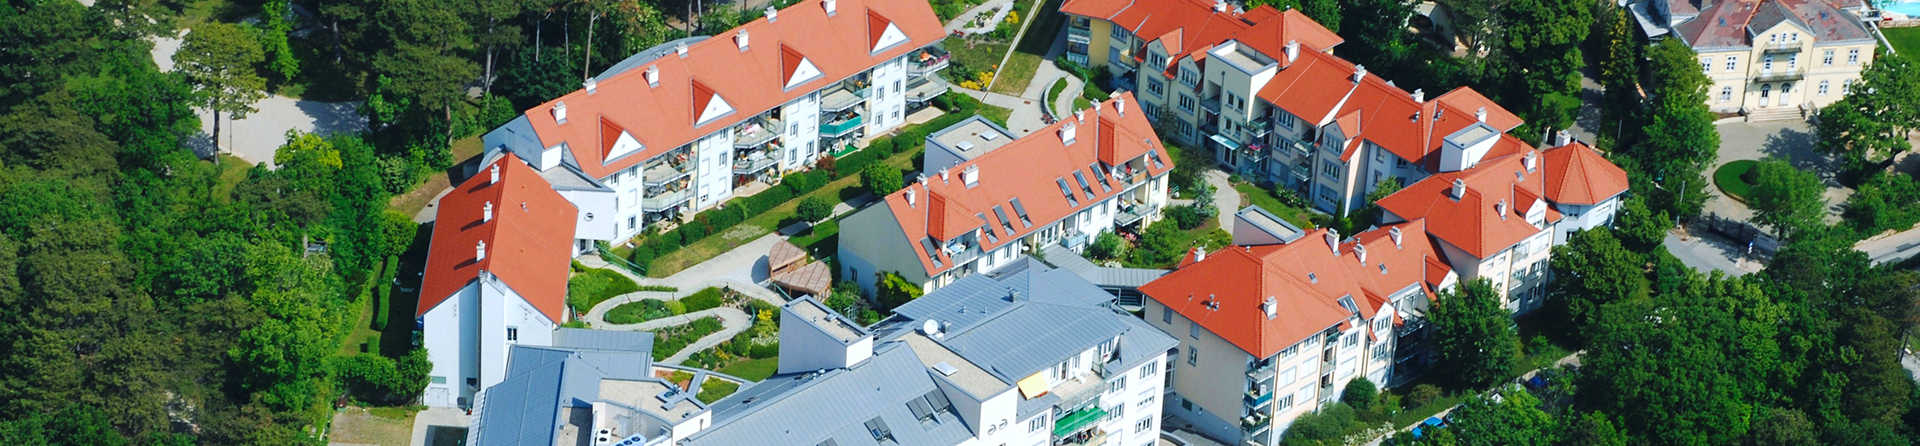 Herzlich willkommen - Seniorenresidenz Bad Vslau